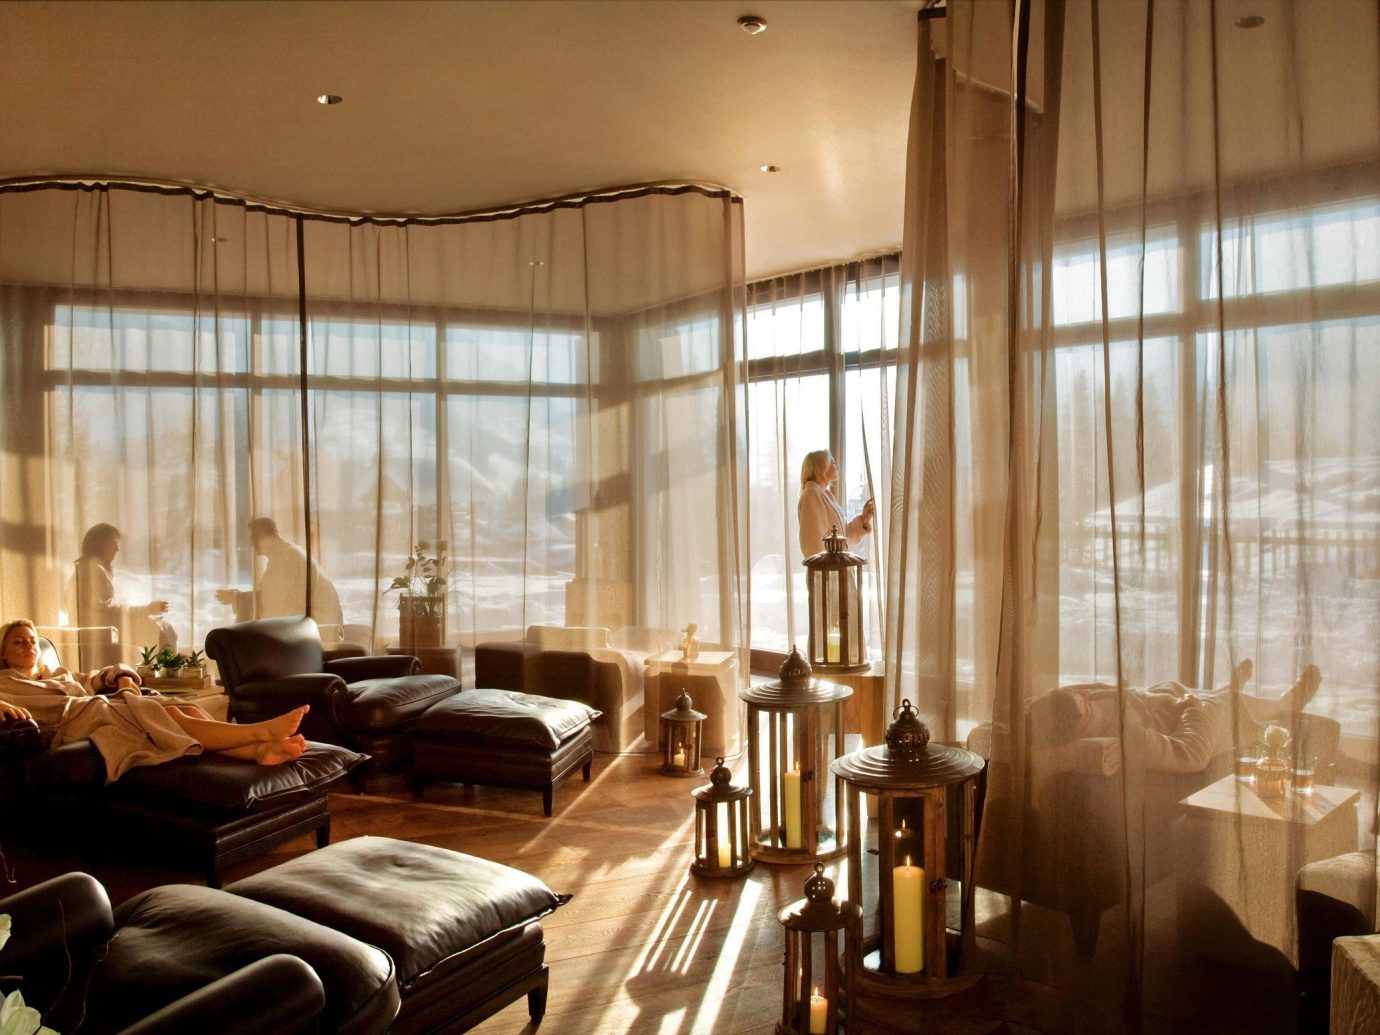 Trip Ideas indoor window room Living interior design restaurant Lobby estate lighting home window covering living room Suite ballroom furniture decorated